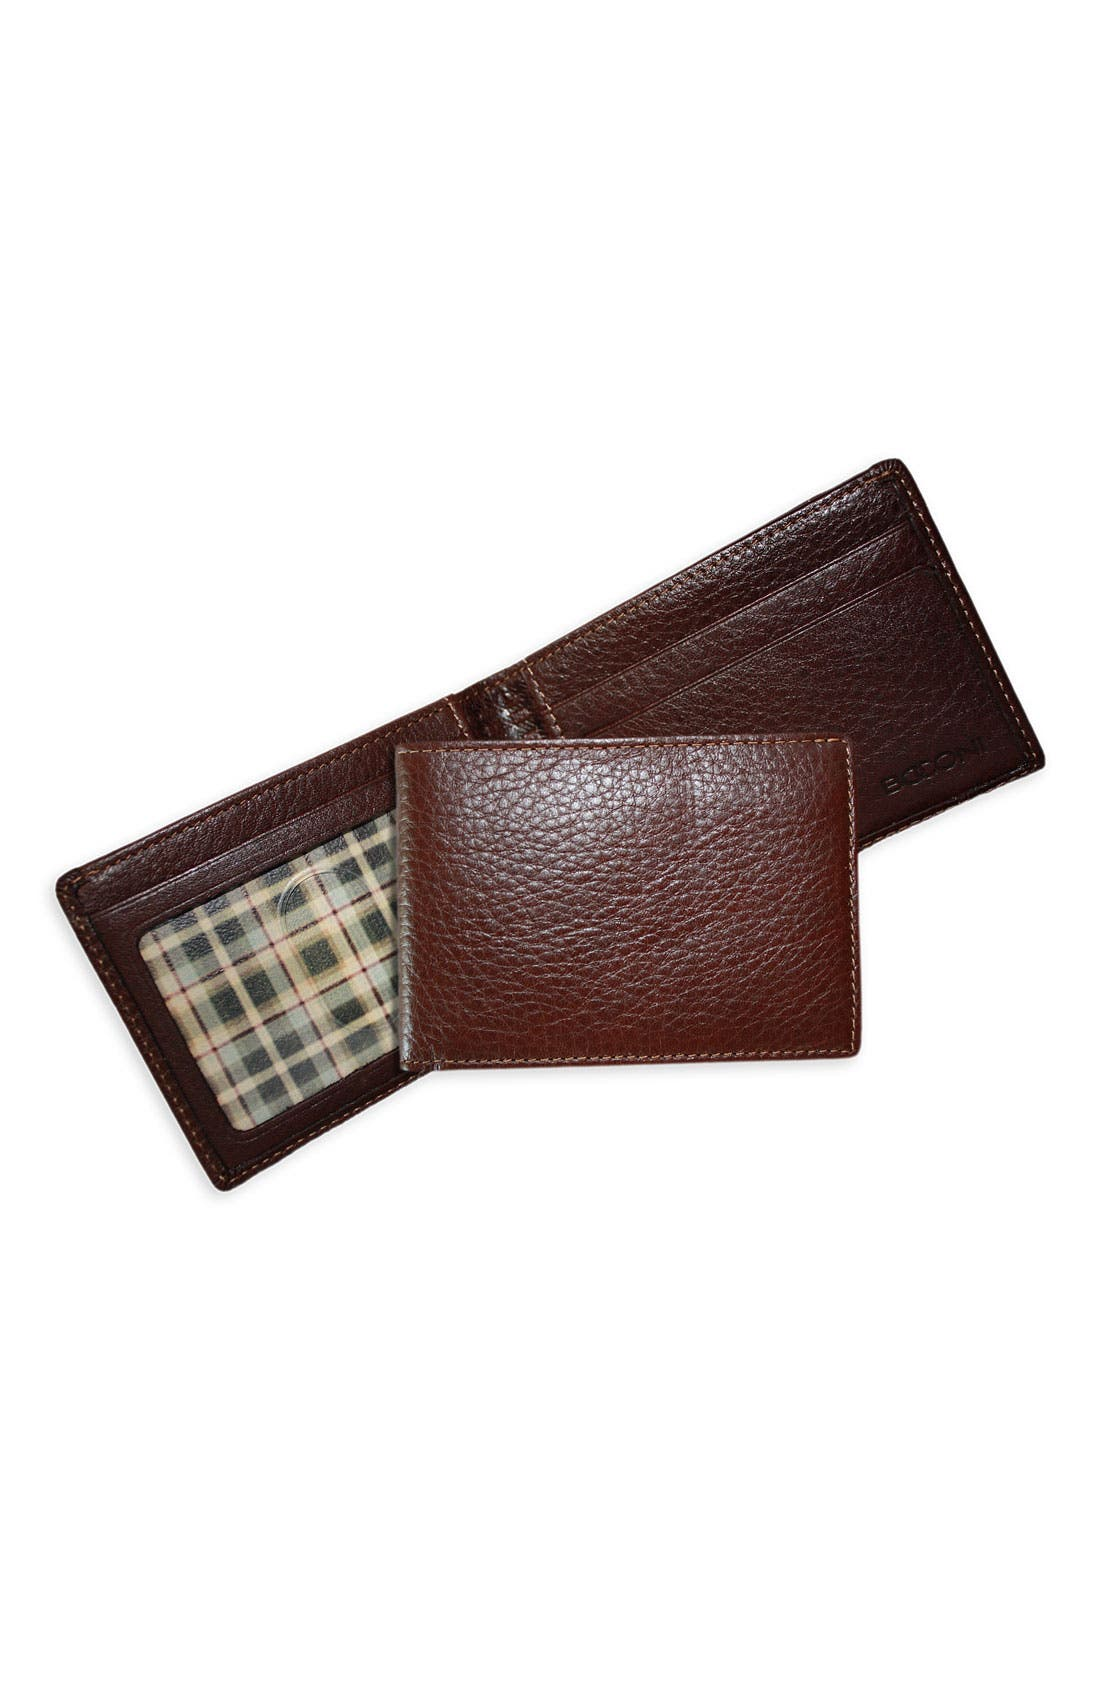 Main Image - Boconi 'Slimster' Wallet